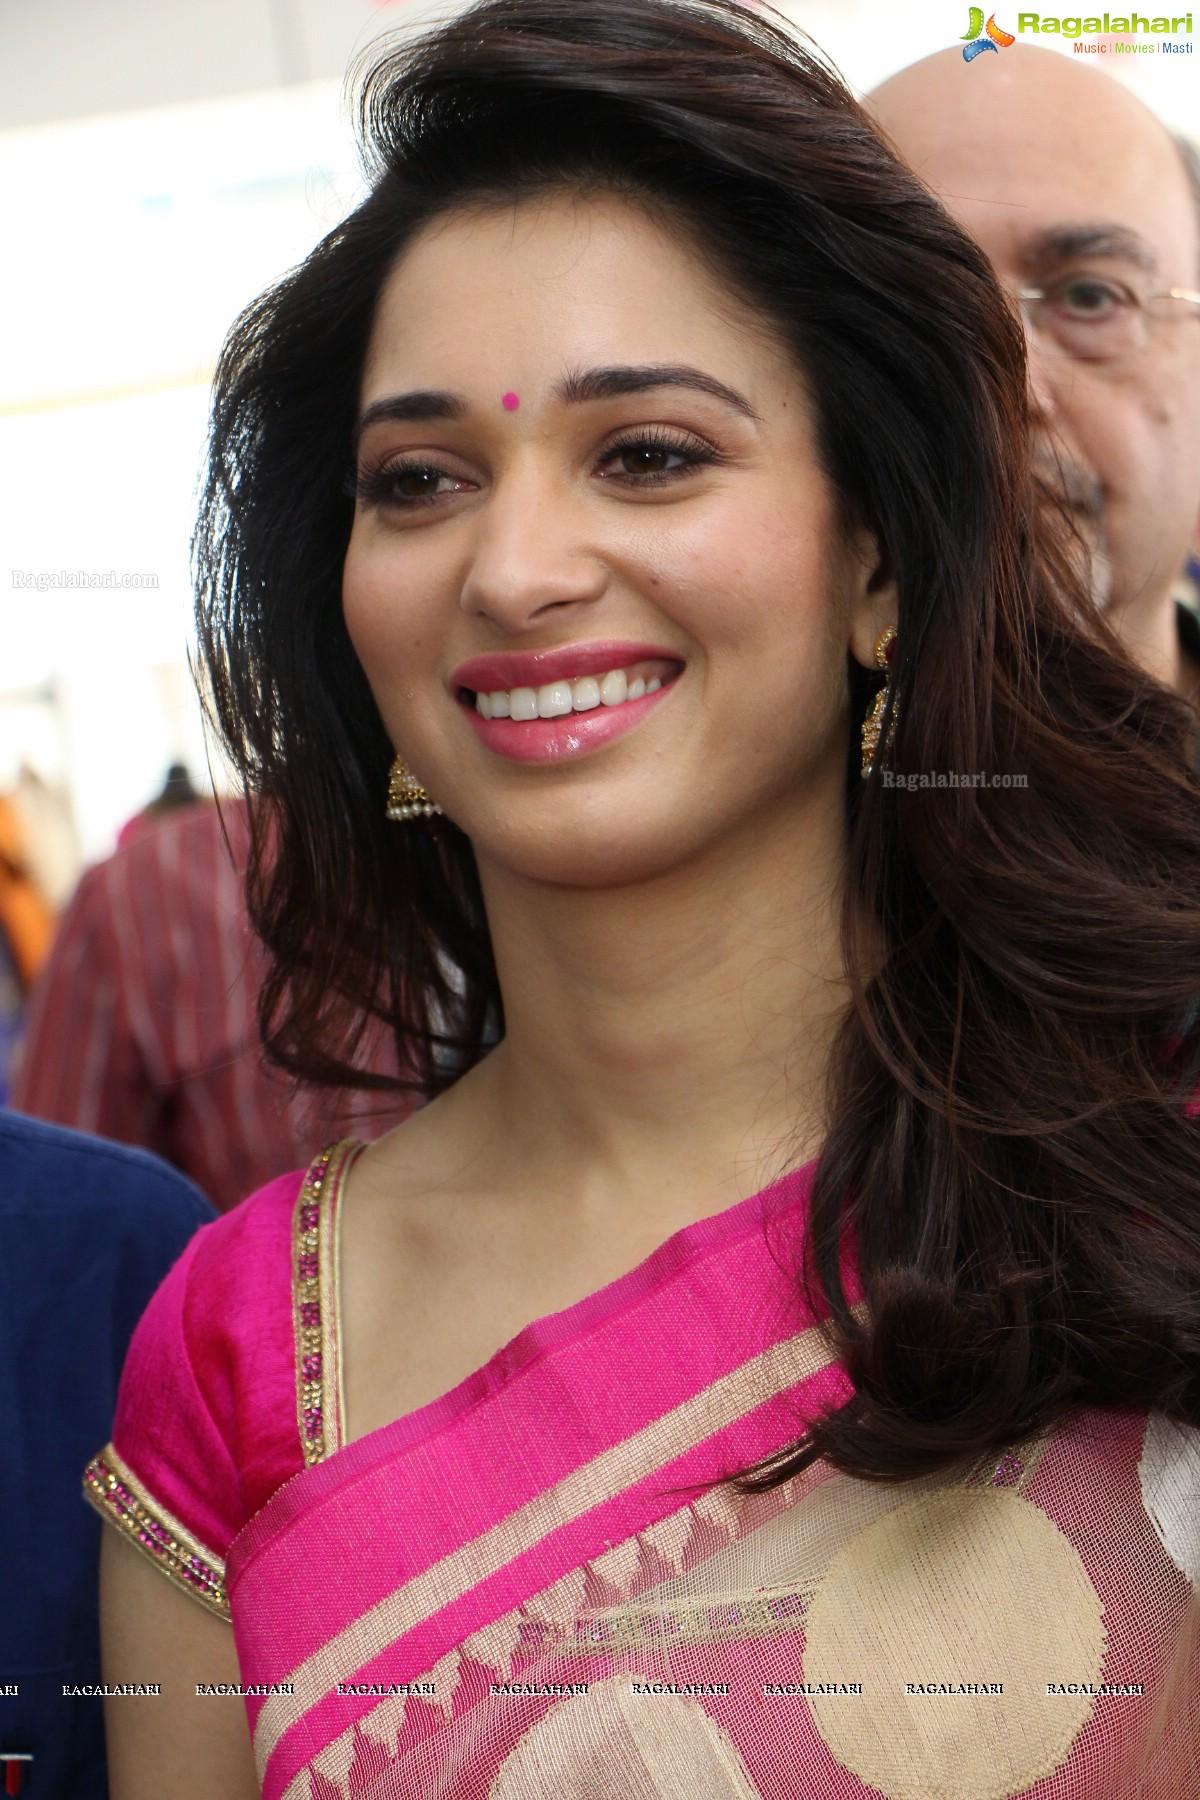 tamanna bhatia image 86   telugu actress wallpapers ,telugu movie